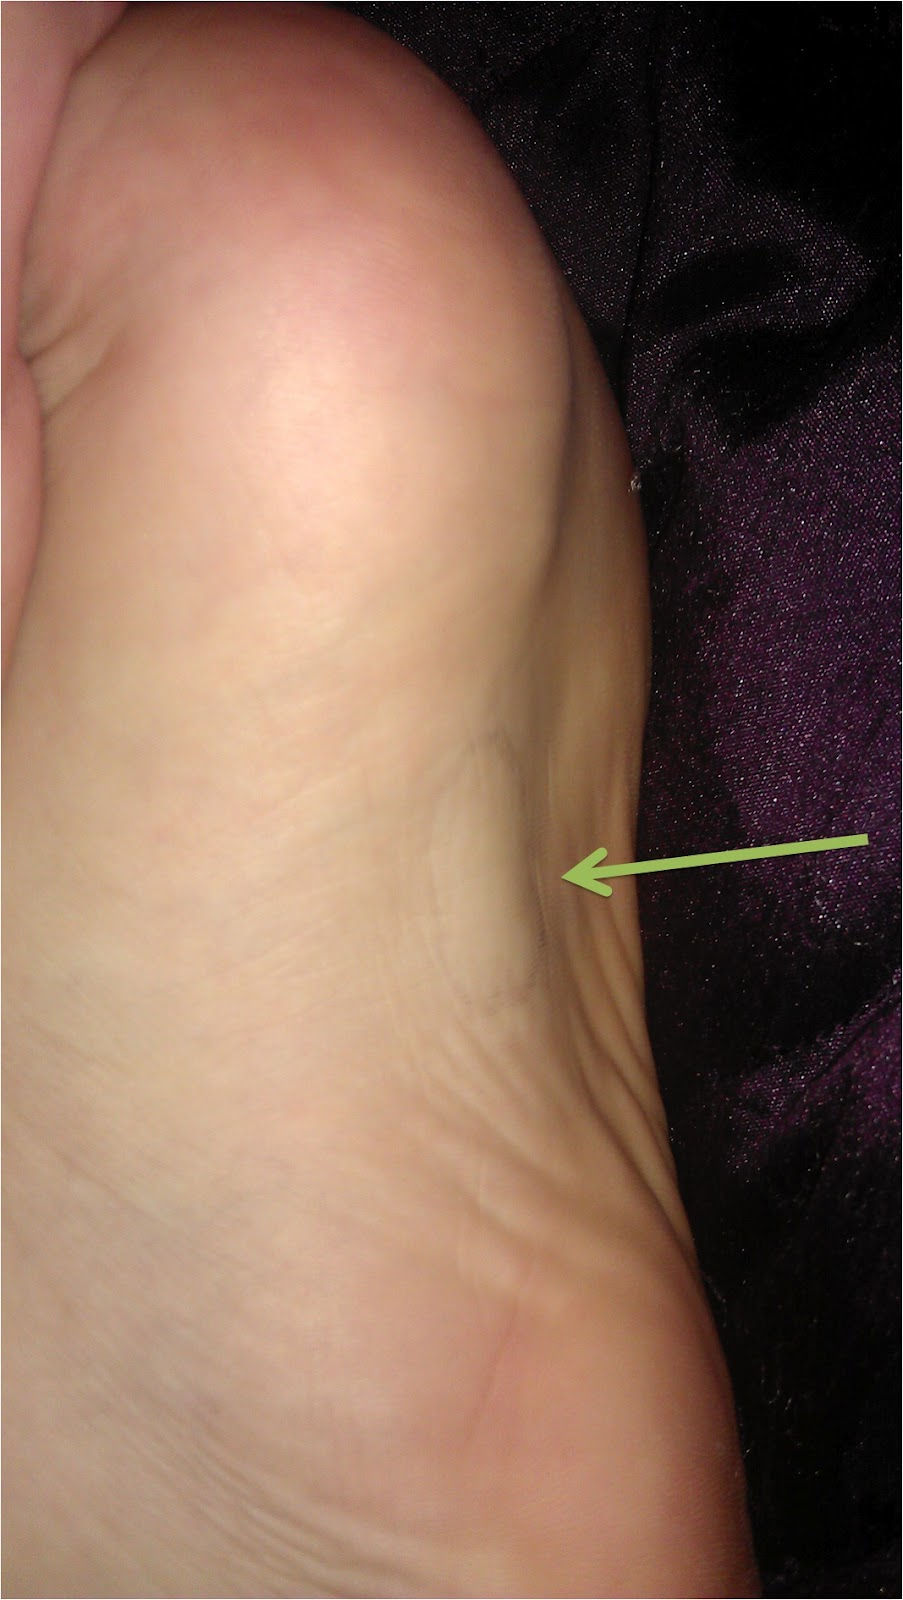 Lump on bottom of foot